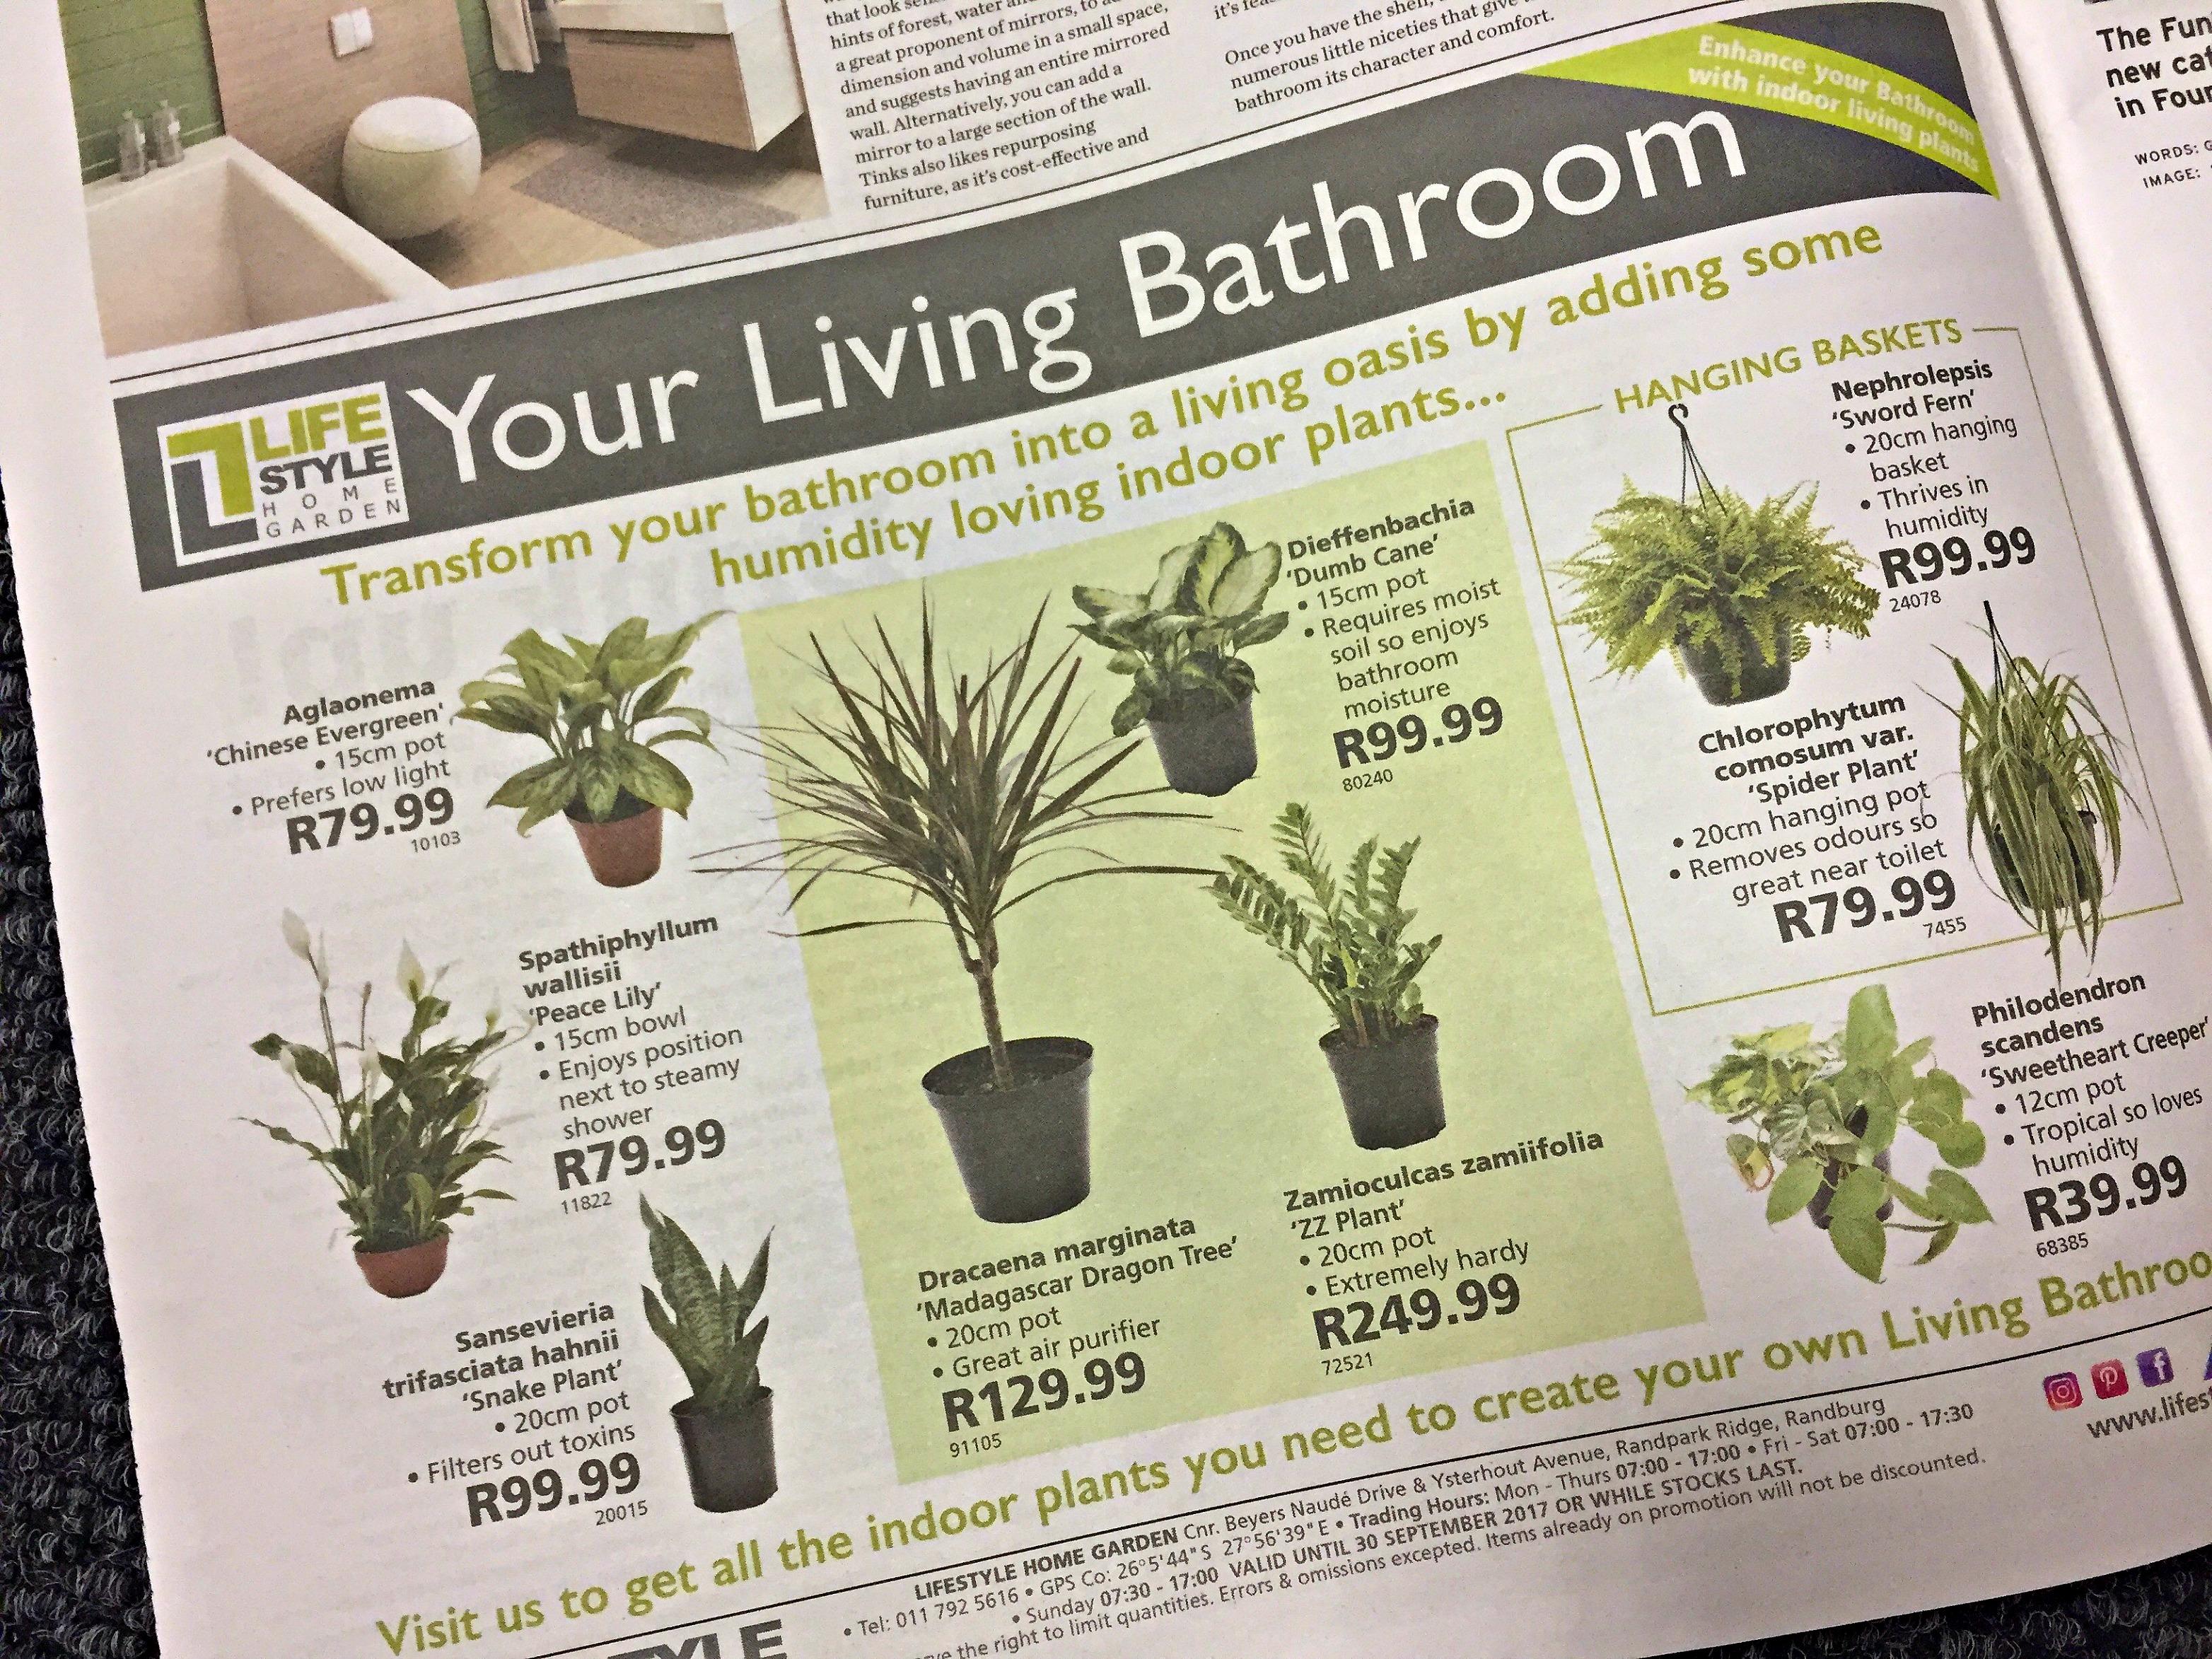 Bathroom Indoor Plants from Lifestyle Home Garden, Nursery and Plant Shop, Randburg, Johannesburg